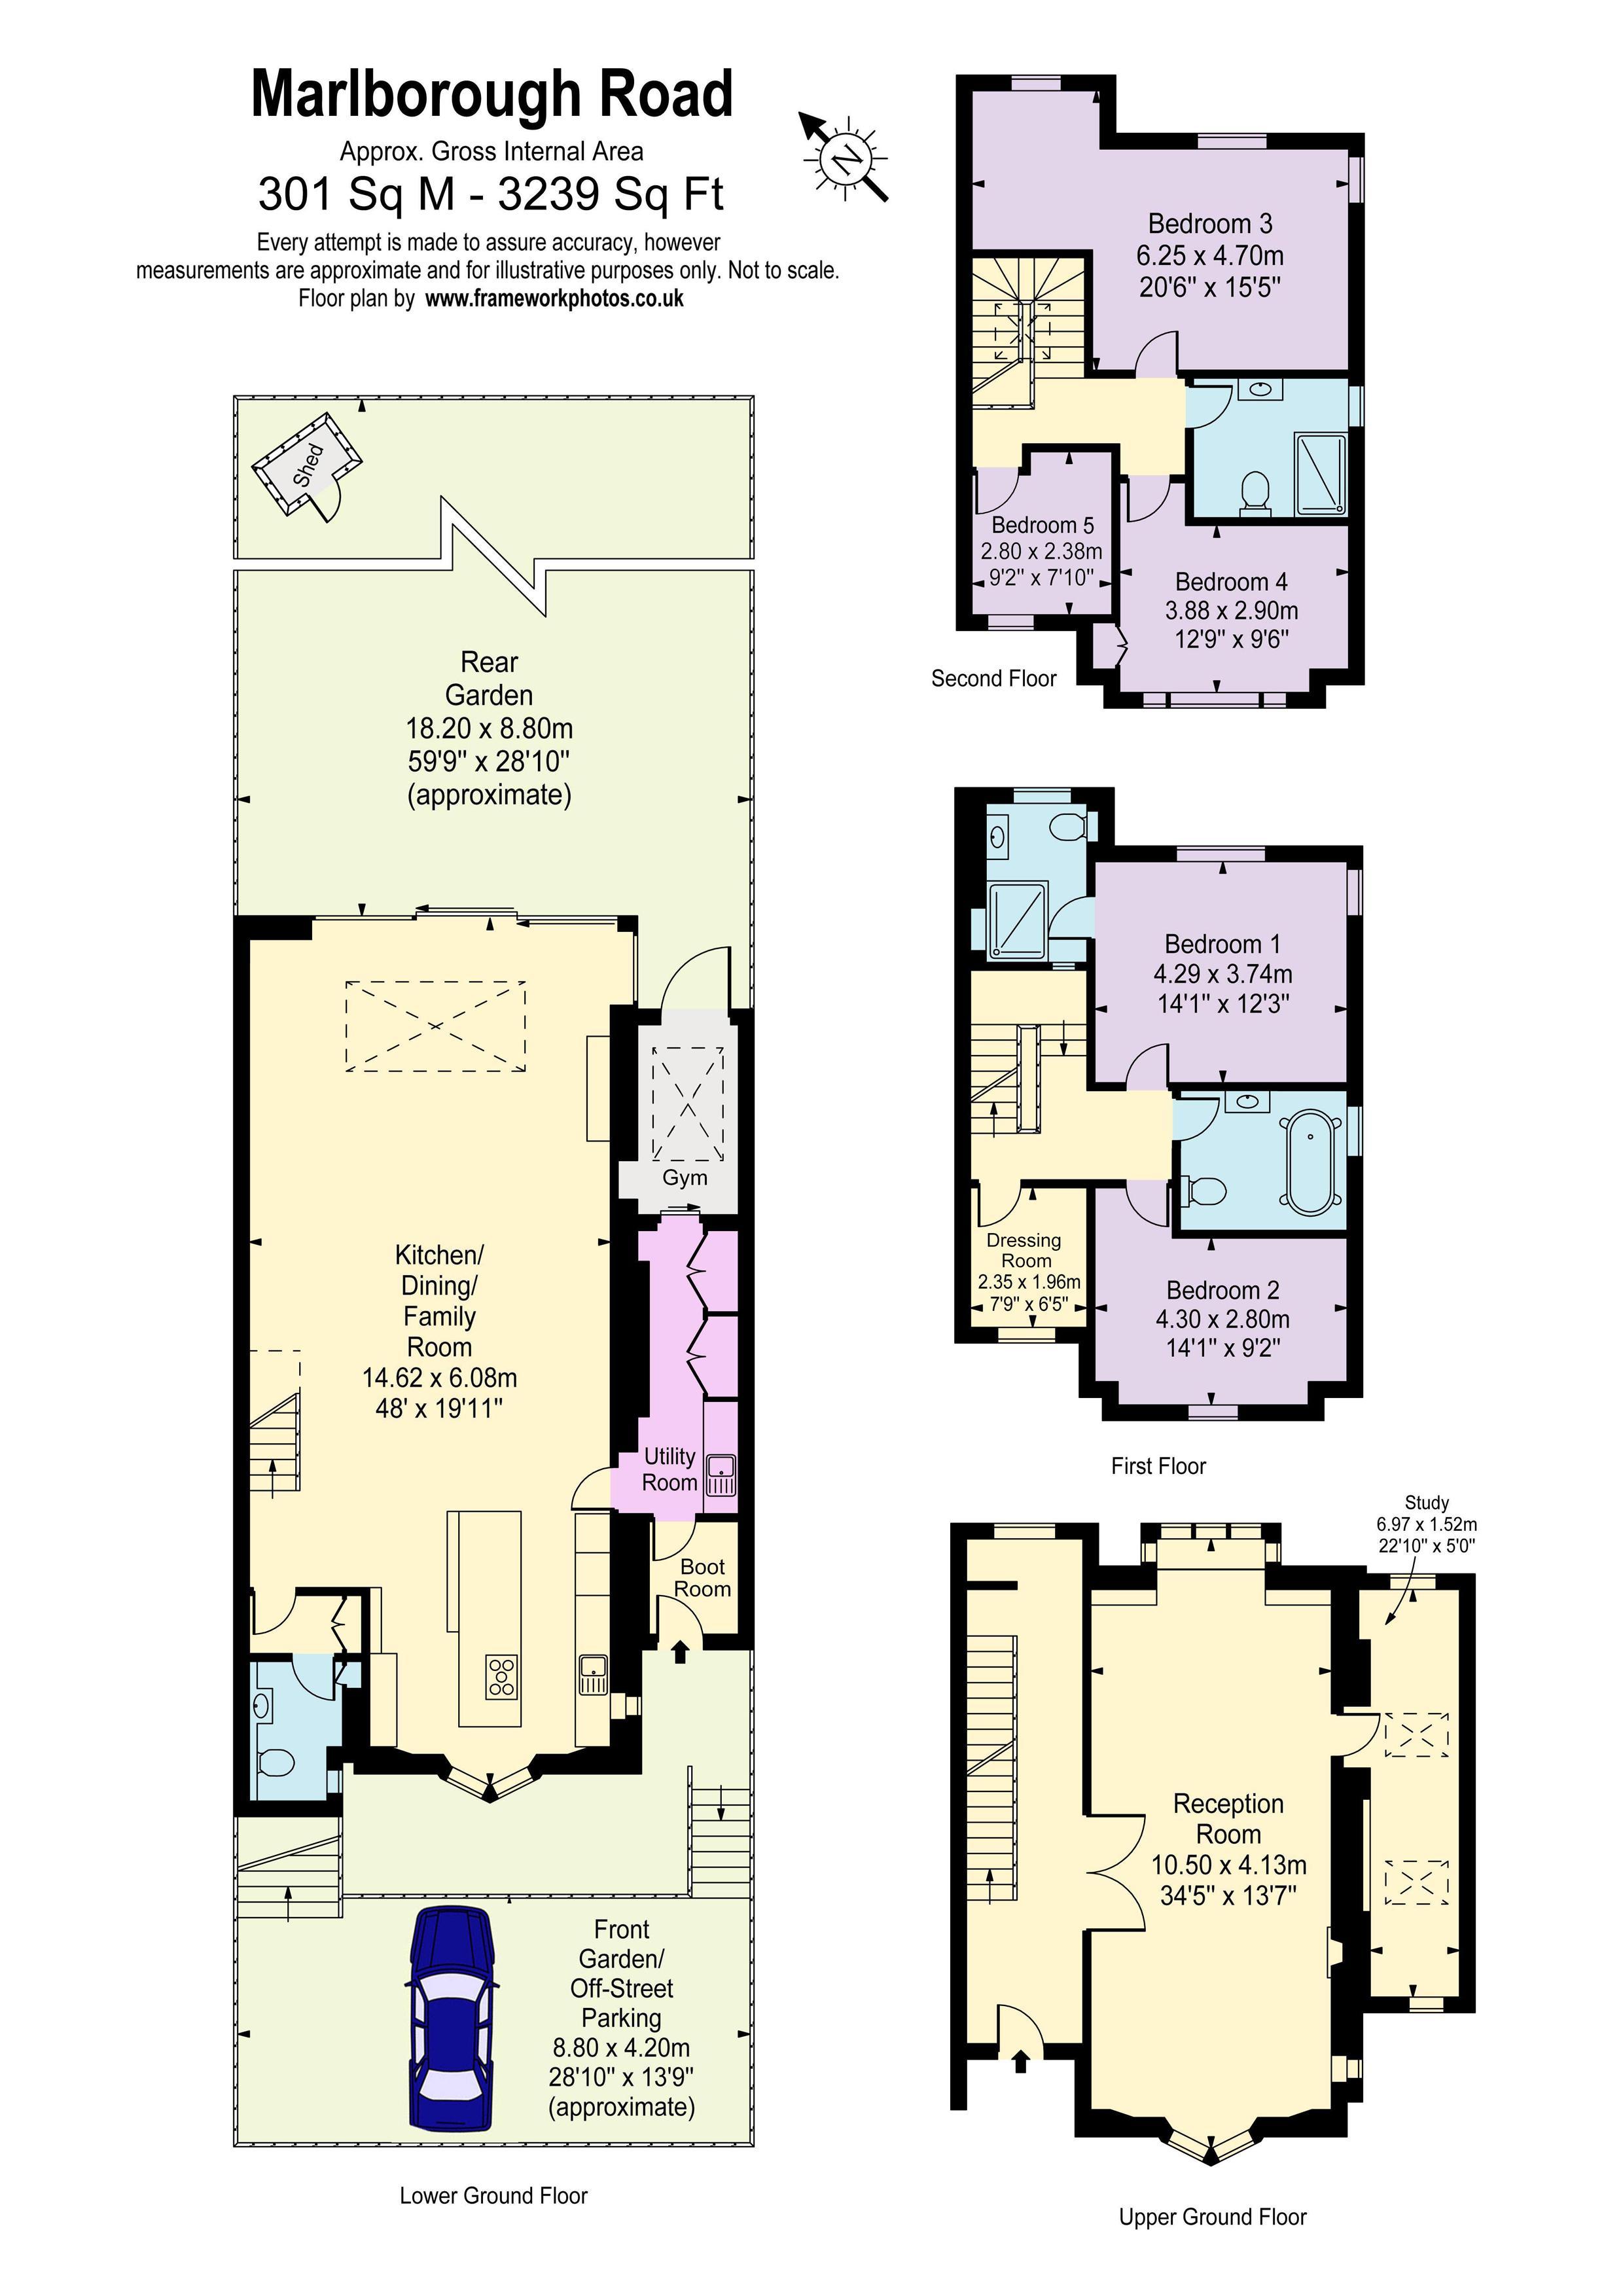 5 Bedroom House The Corporate Letting Company – Marlborough House Floor Plan